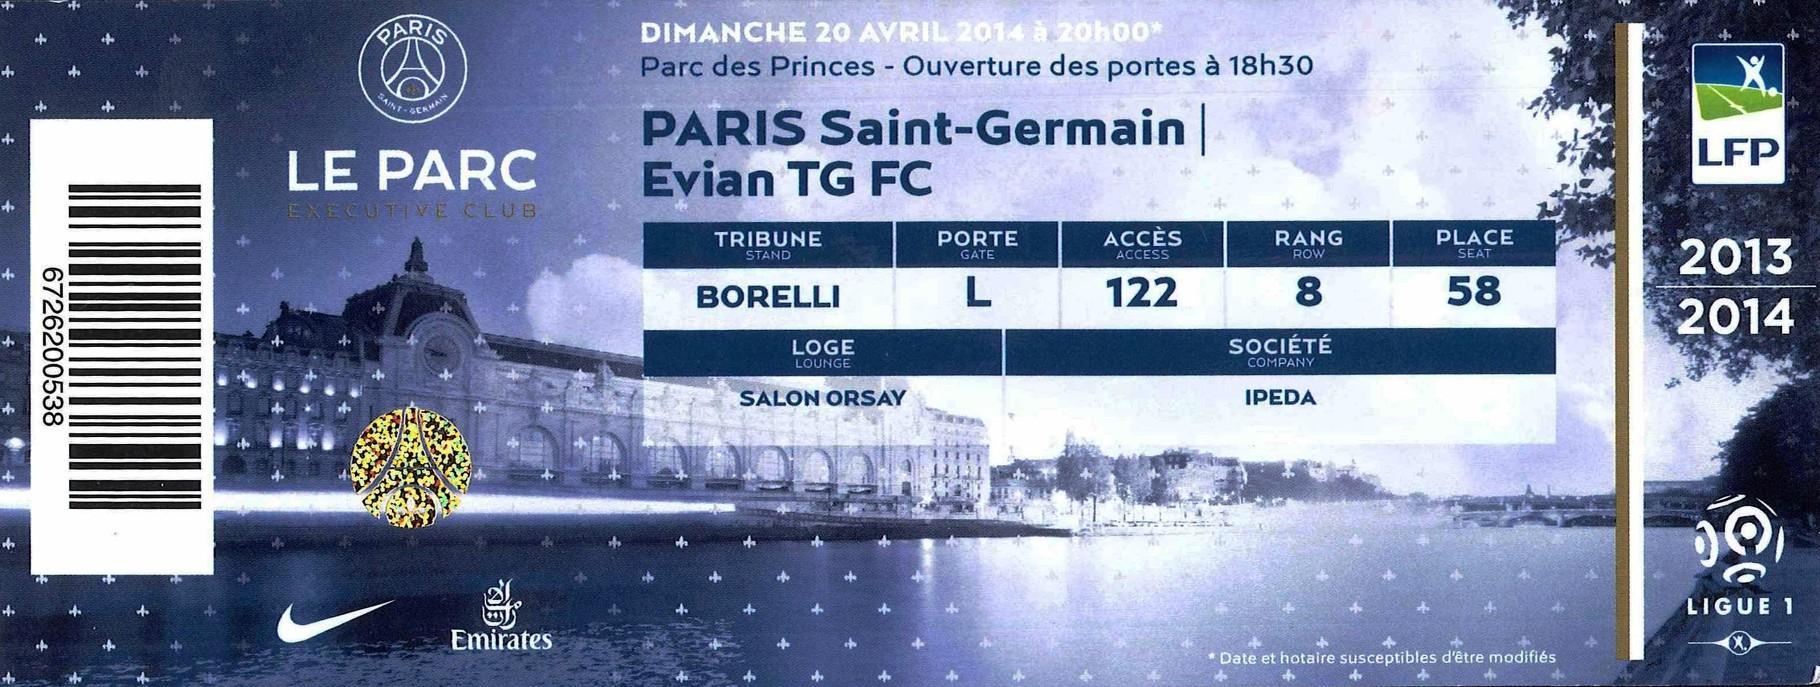 2014-04-23  PSG-Evian TG (34ème L1, Loge 2)